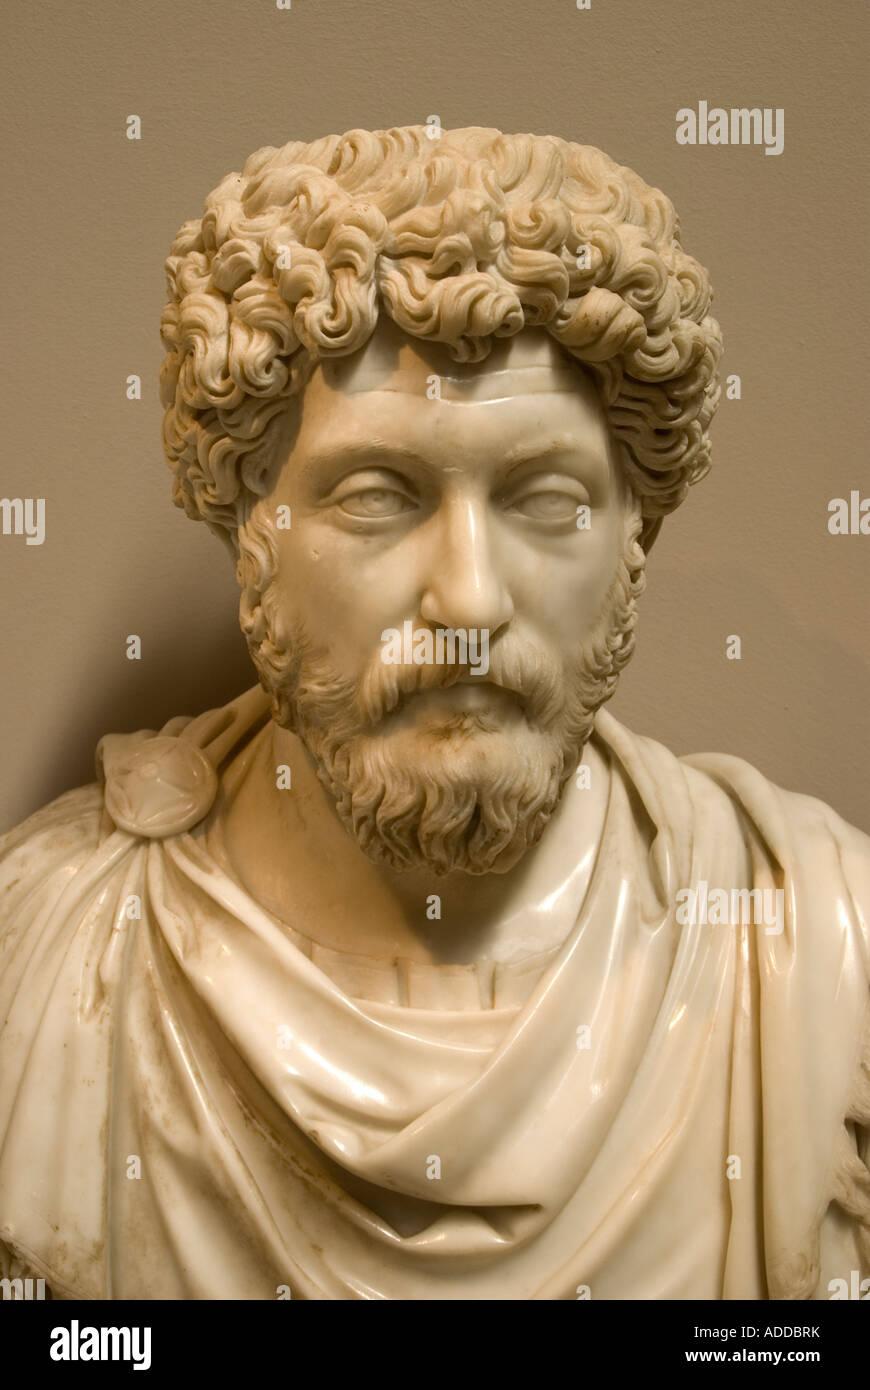 Ephesus Museum, bust of Roman Emperor Marcus Aurelius, from 2nd century CE, in Seljuk, Turkey - Stock Image